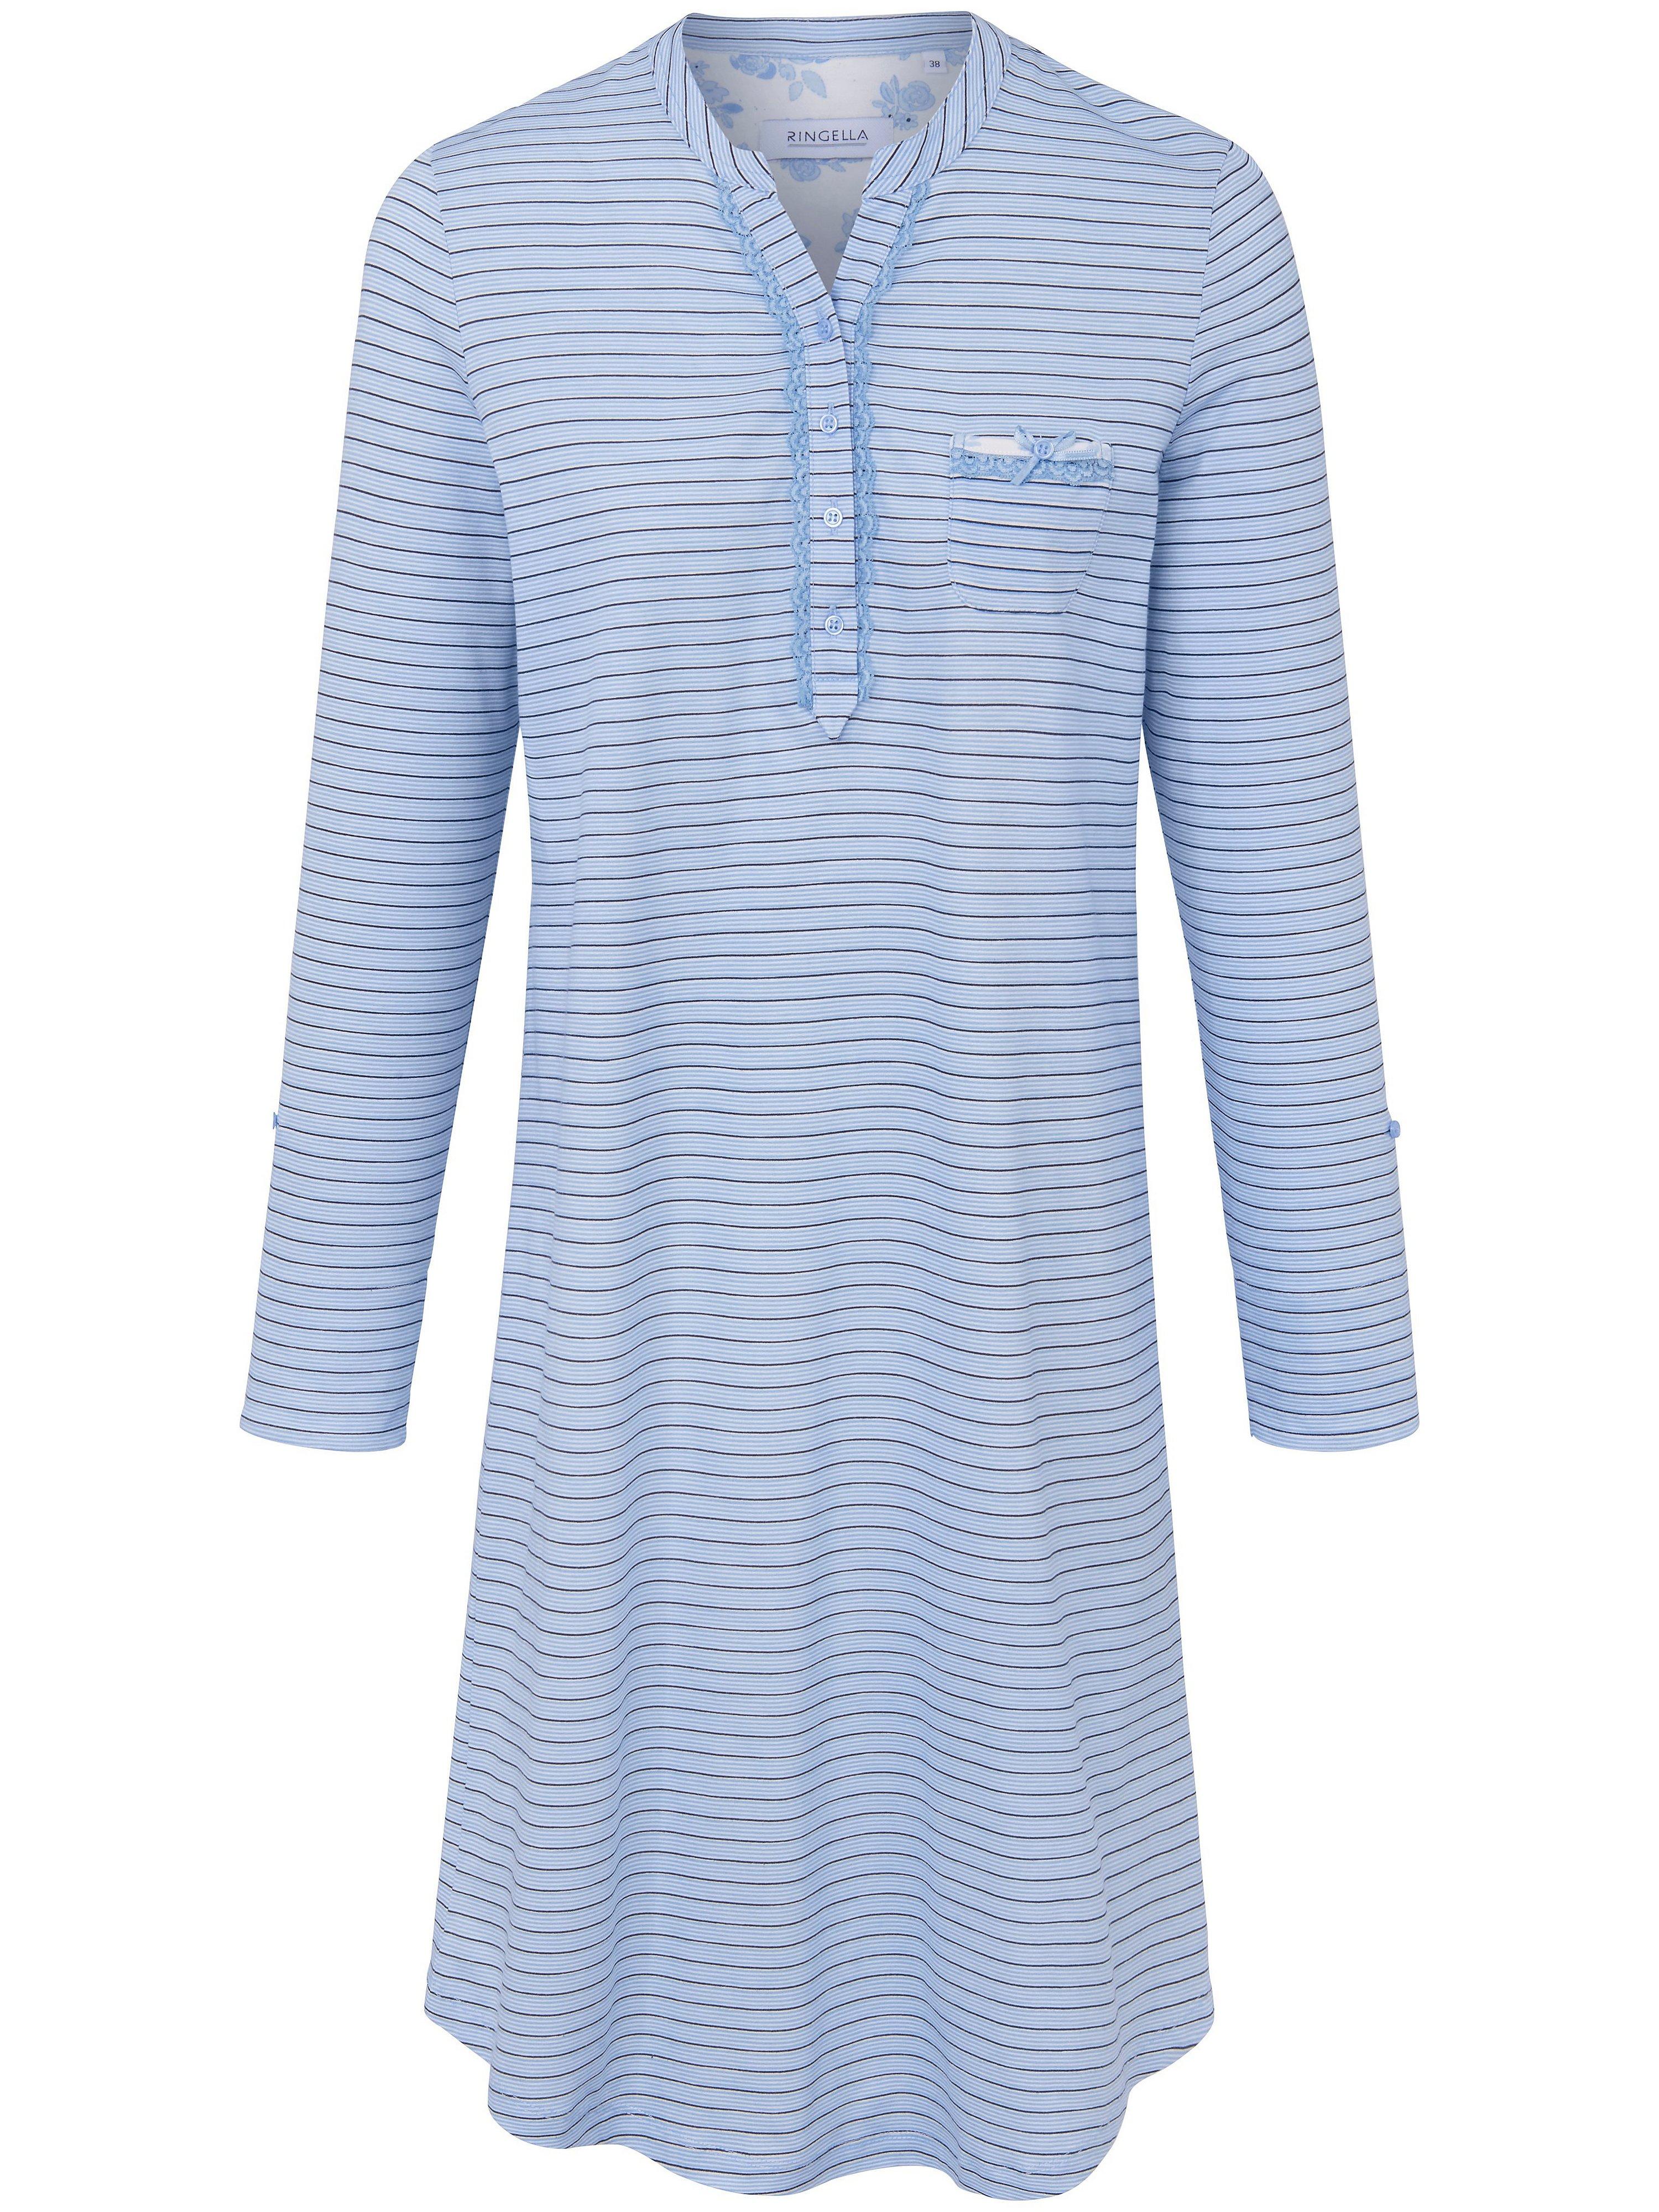 La chemise nuit 100% coton  Ringella multicolore taille 48